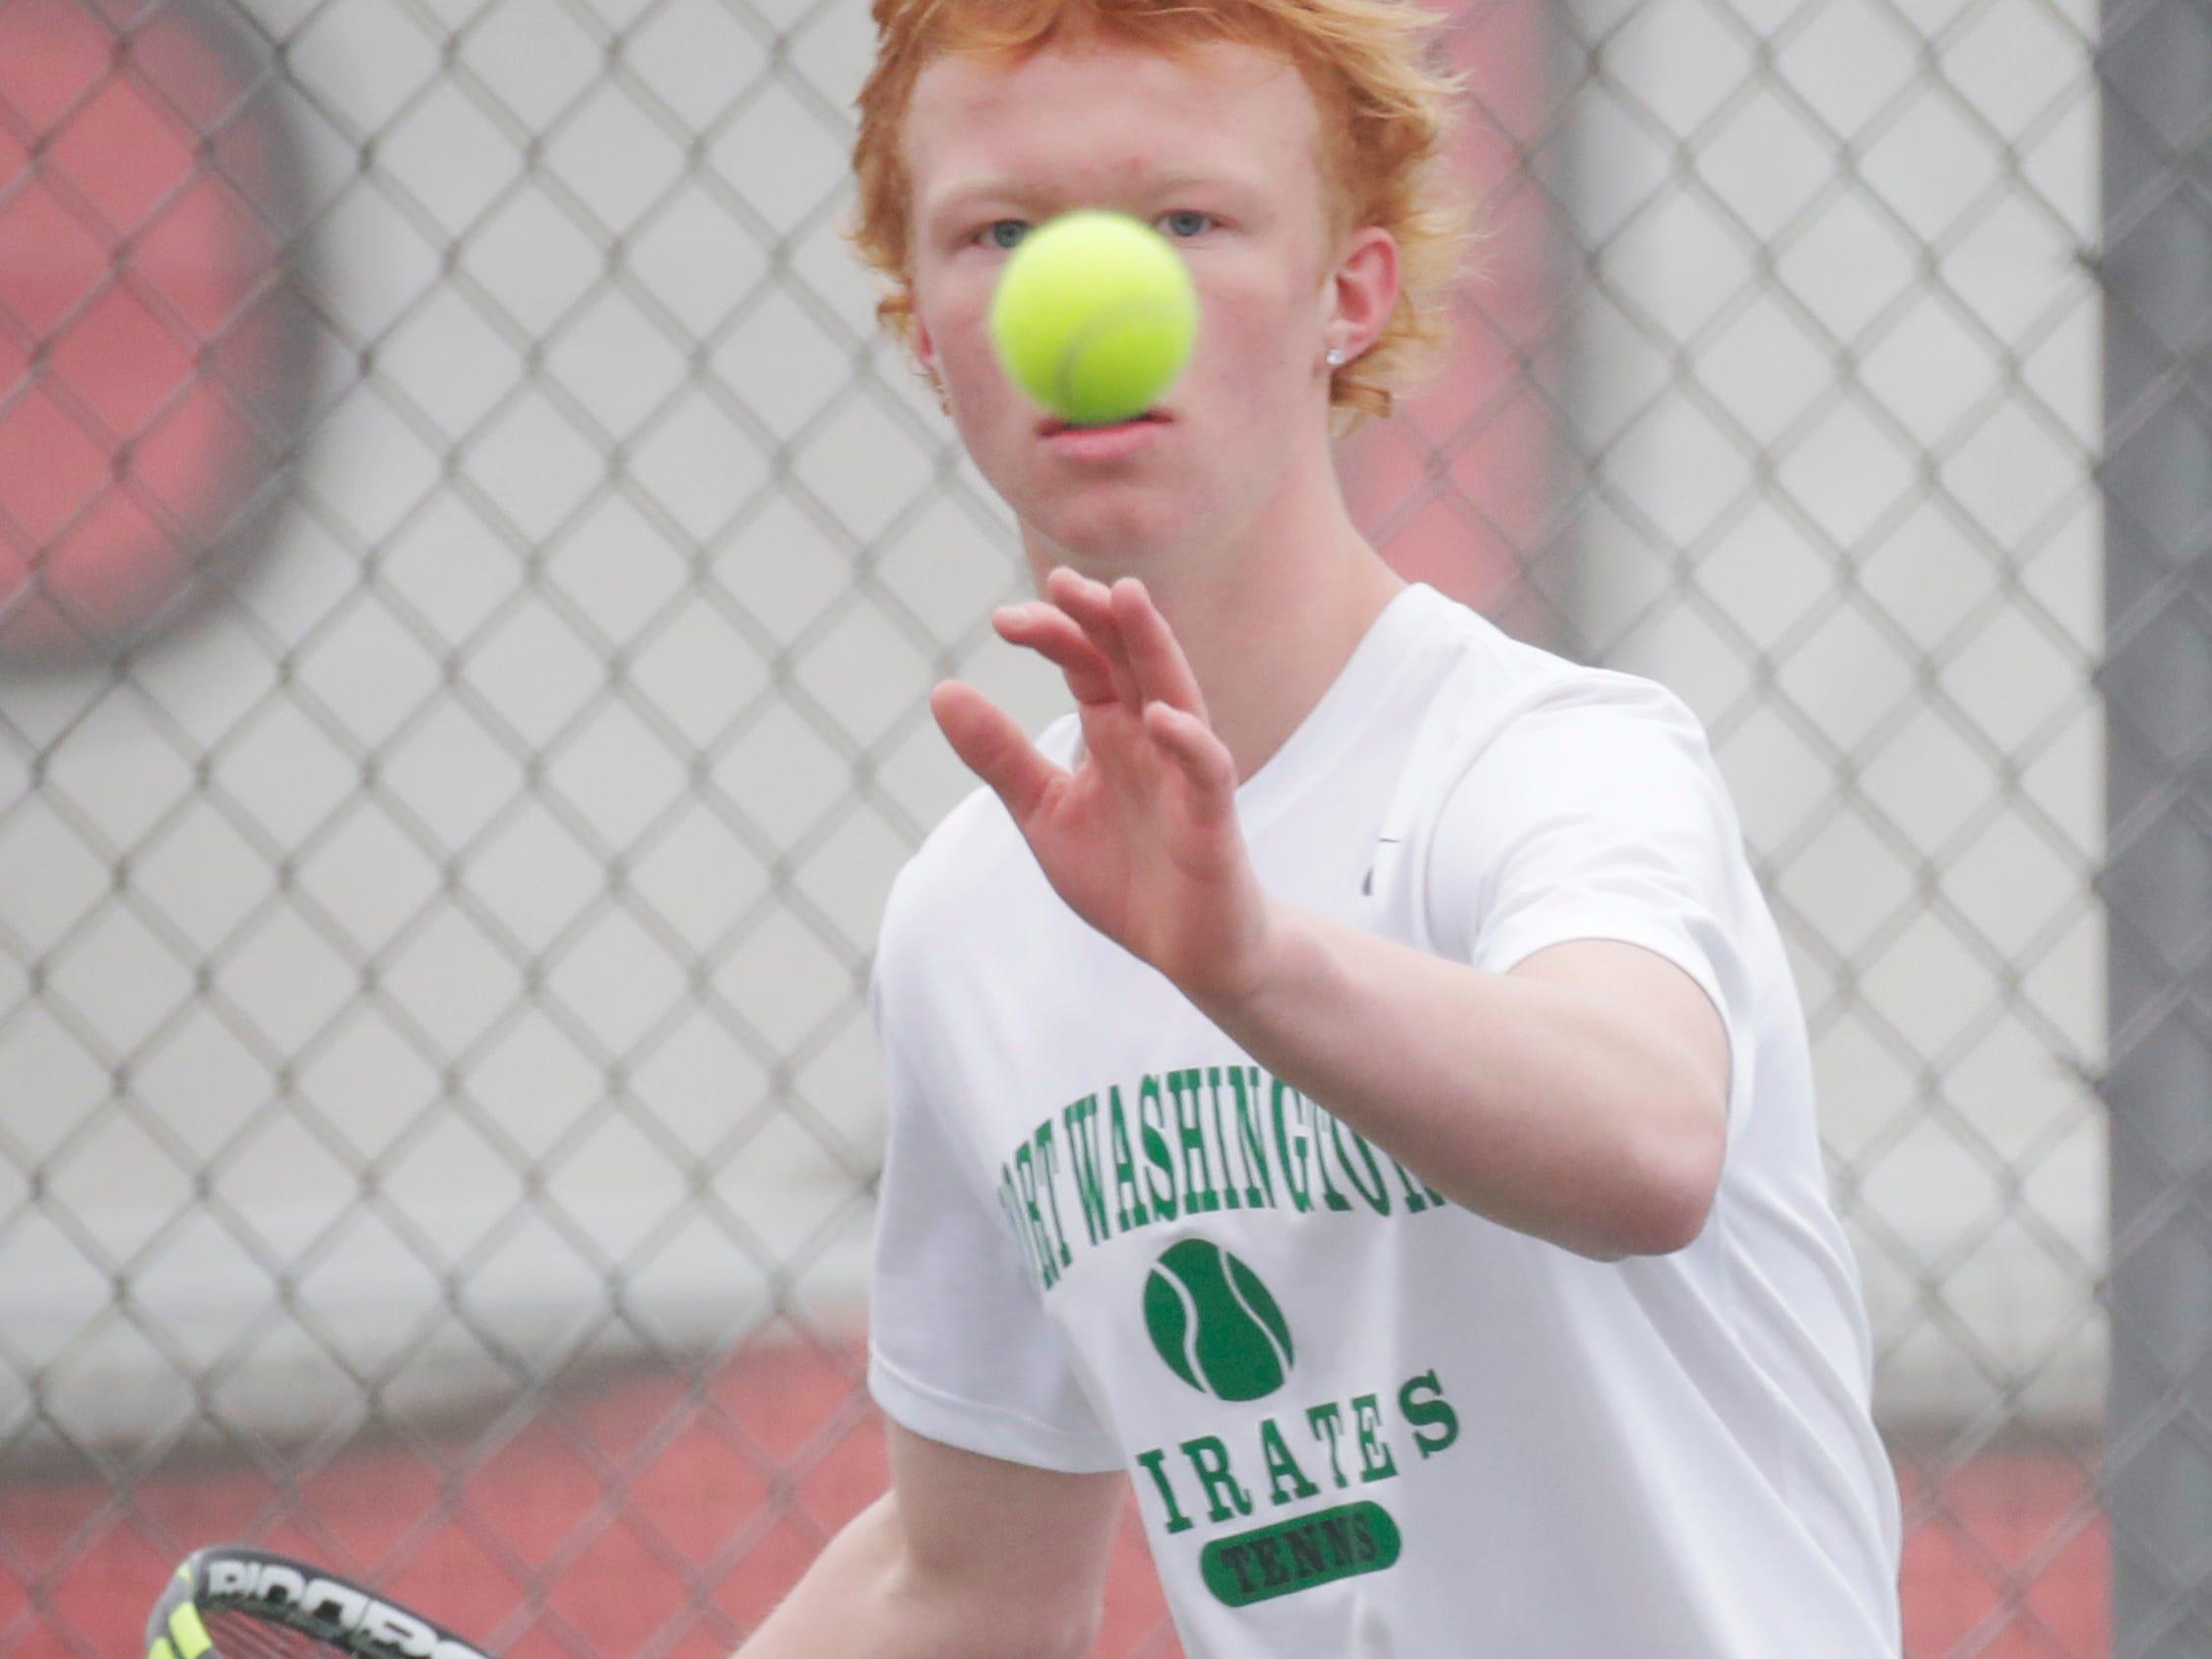 Port Washington's Isaac Welton keeps his eye on the ball during action with Sheboygan South's Nick Larson, Saturday, April 6, 2019, in Sheboygan, Wis.